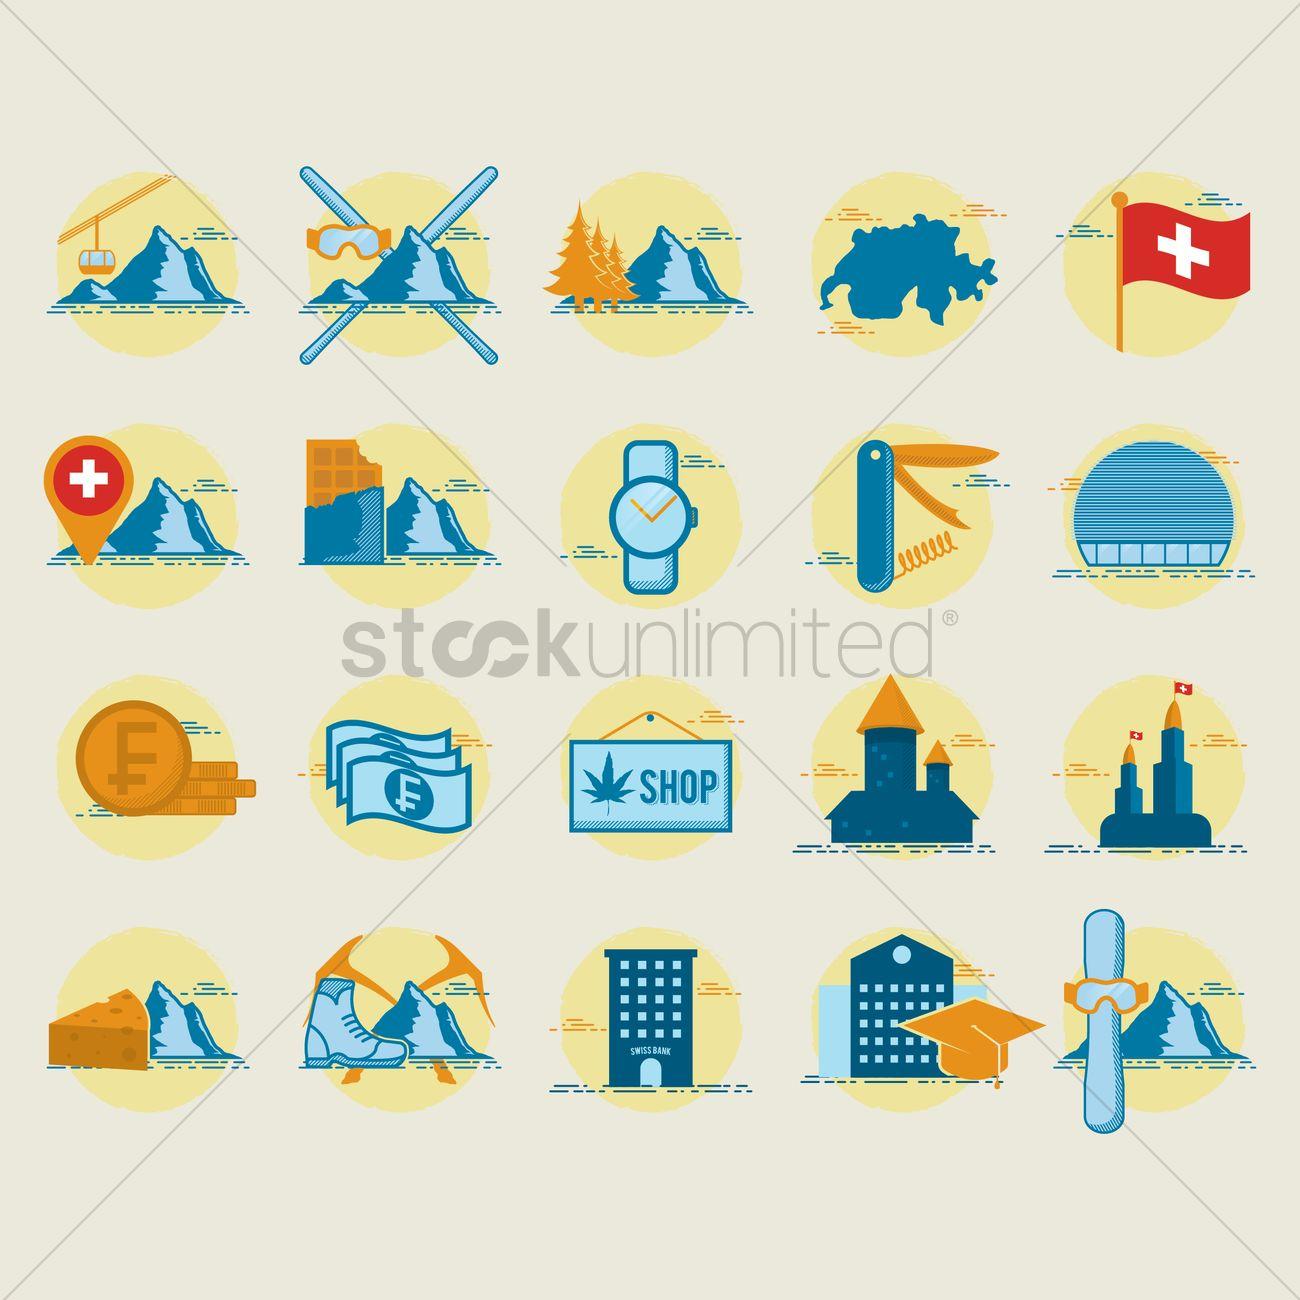 Set of switzerland icons Vector Image - 2033894 | StockUnlimited